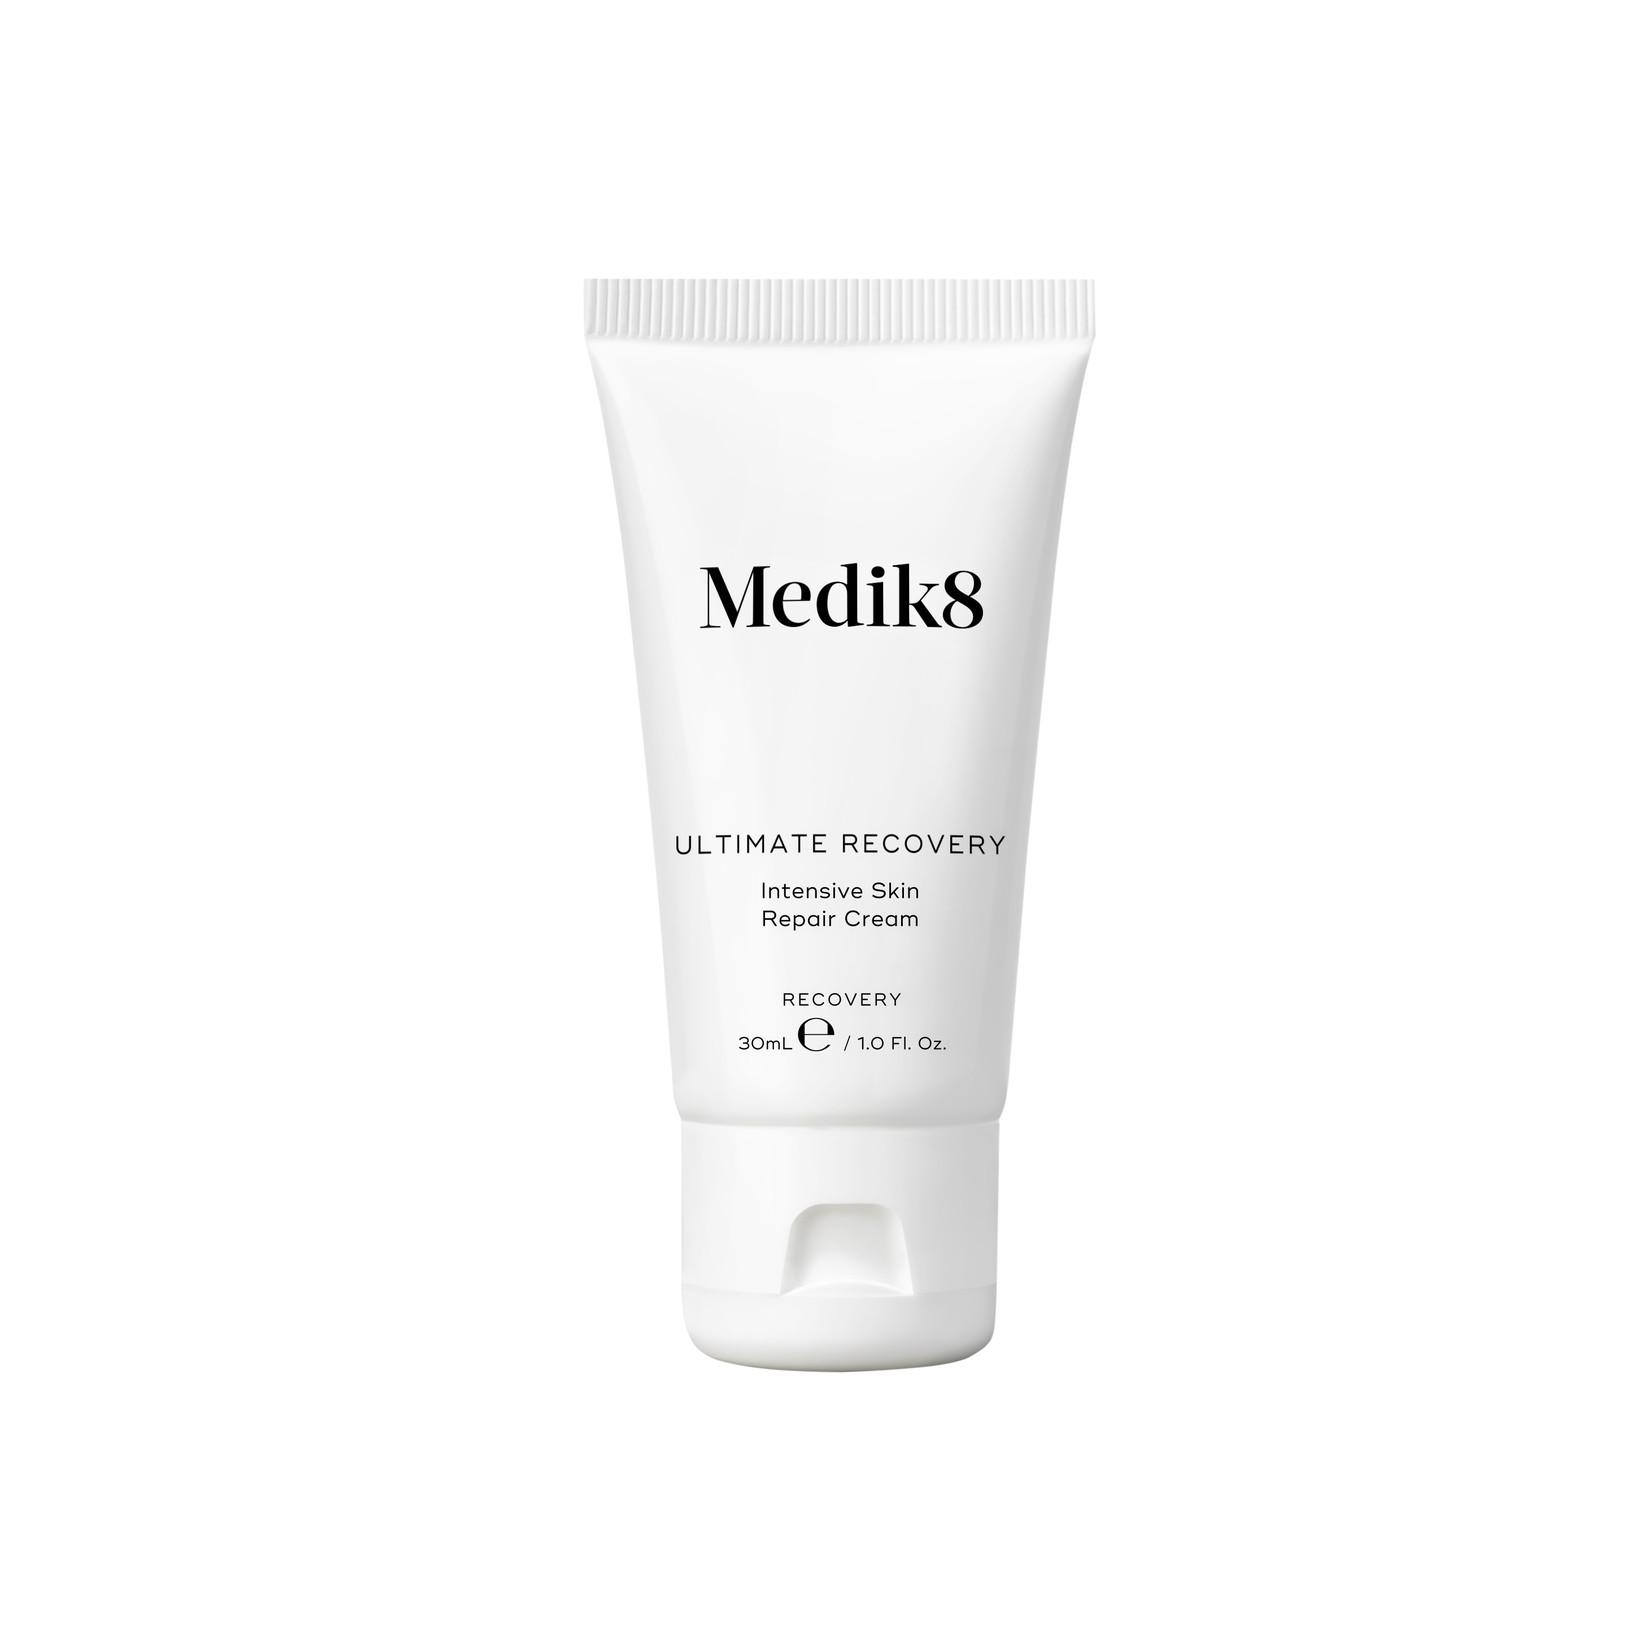 Medik8 Medik8 Ultimate Recovery 30ml